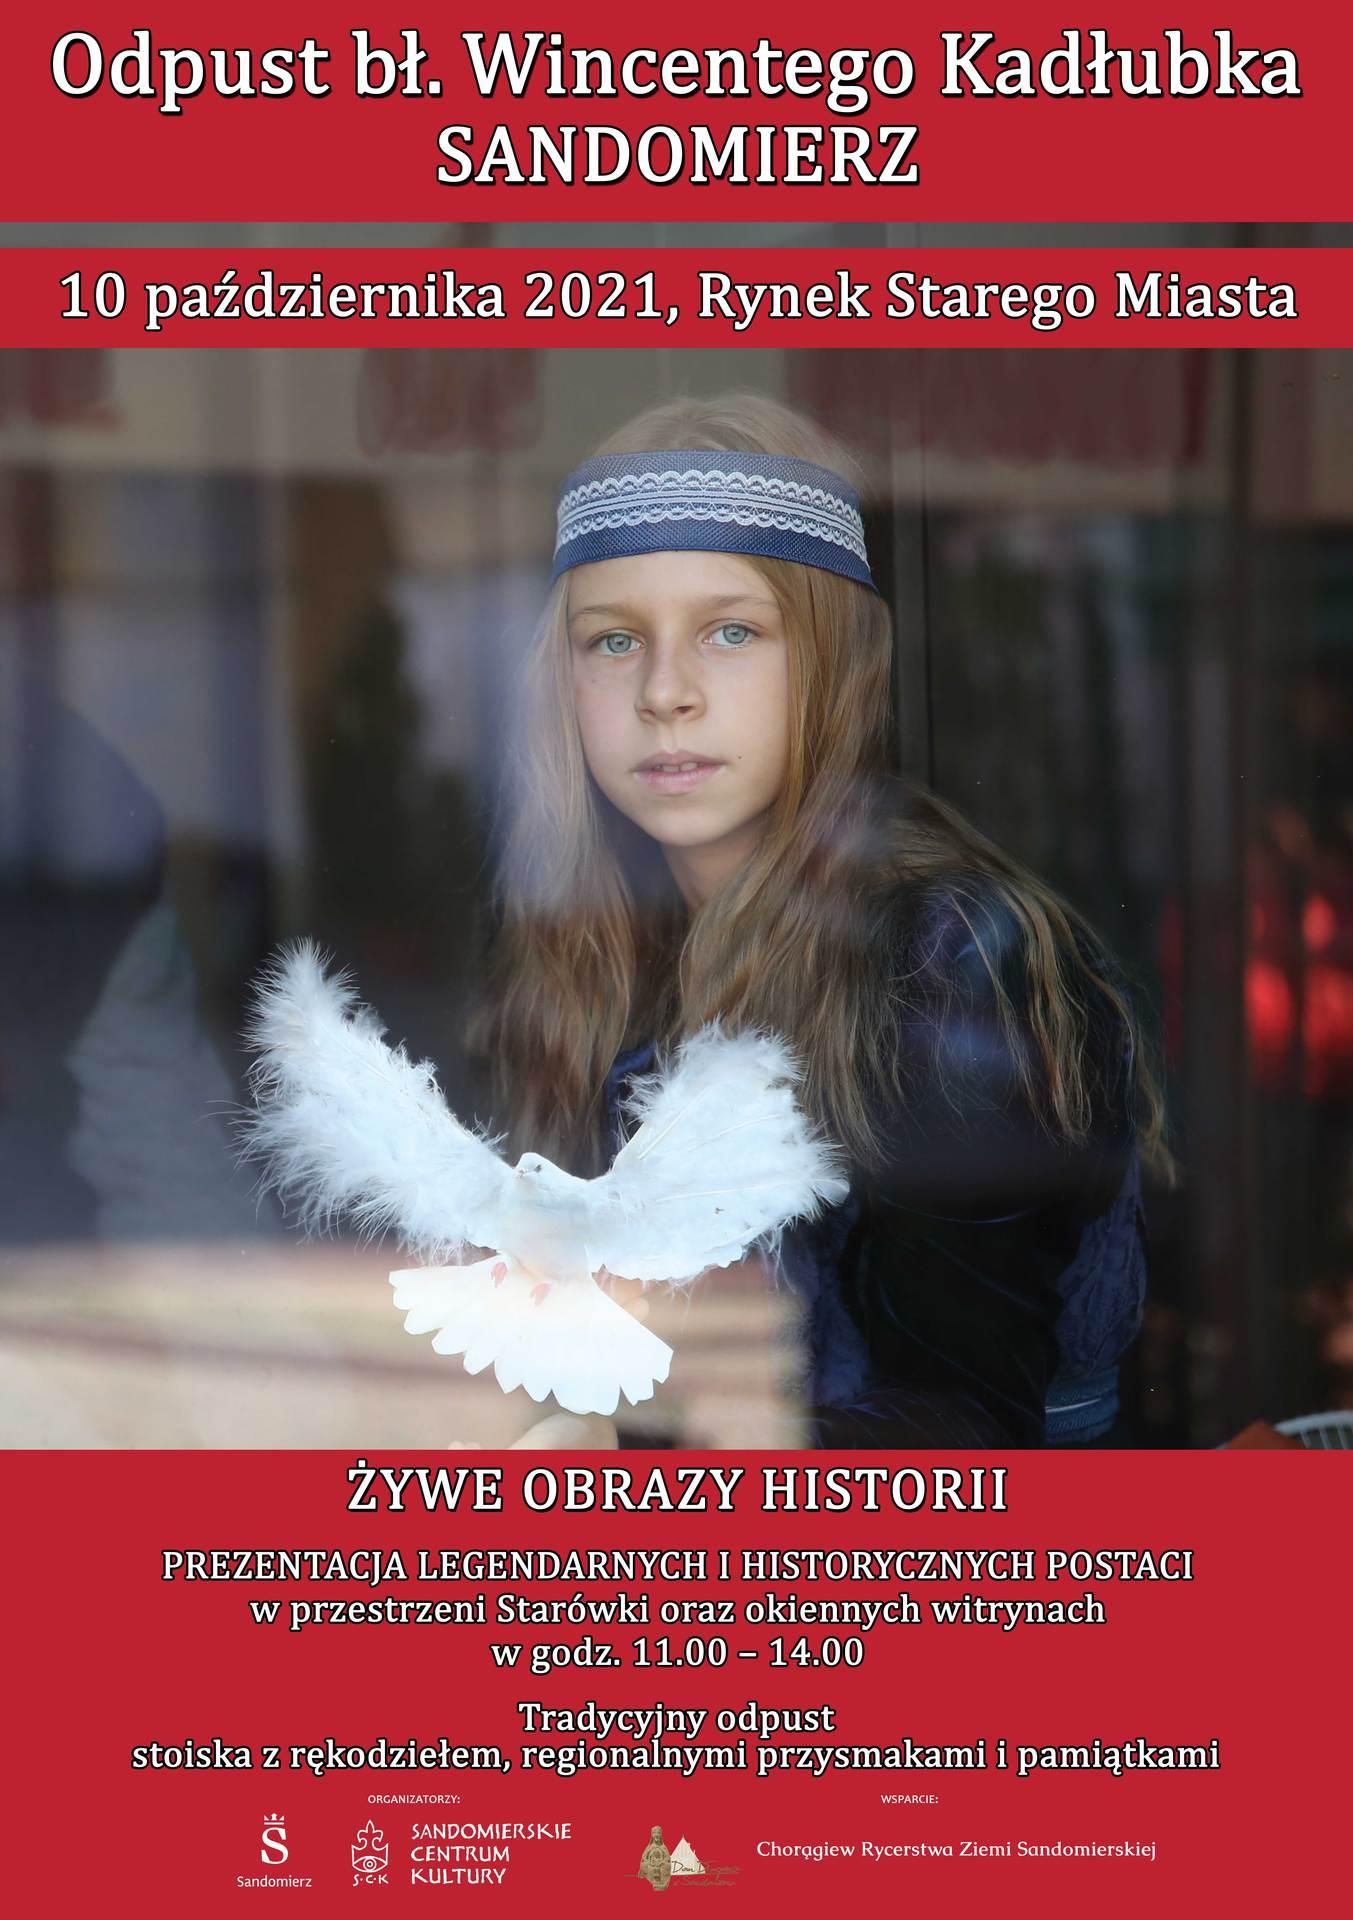 Odpust_Kadlubek2021.jpeg